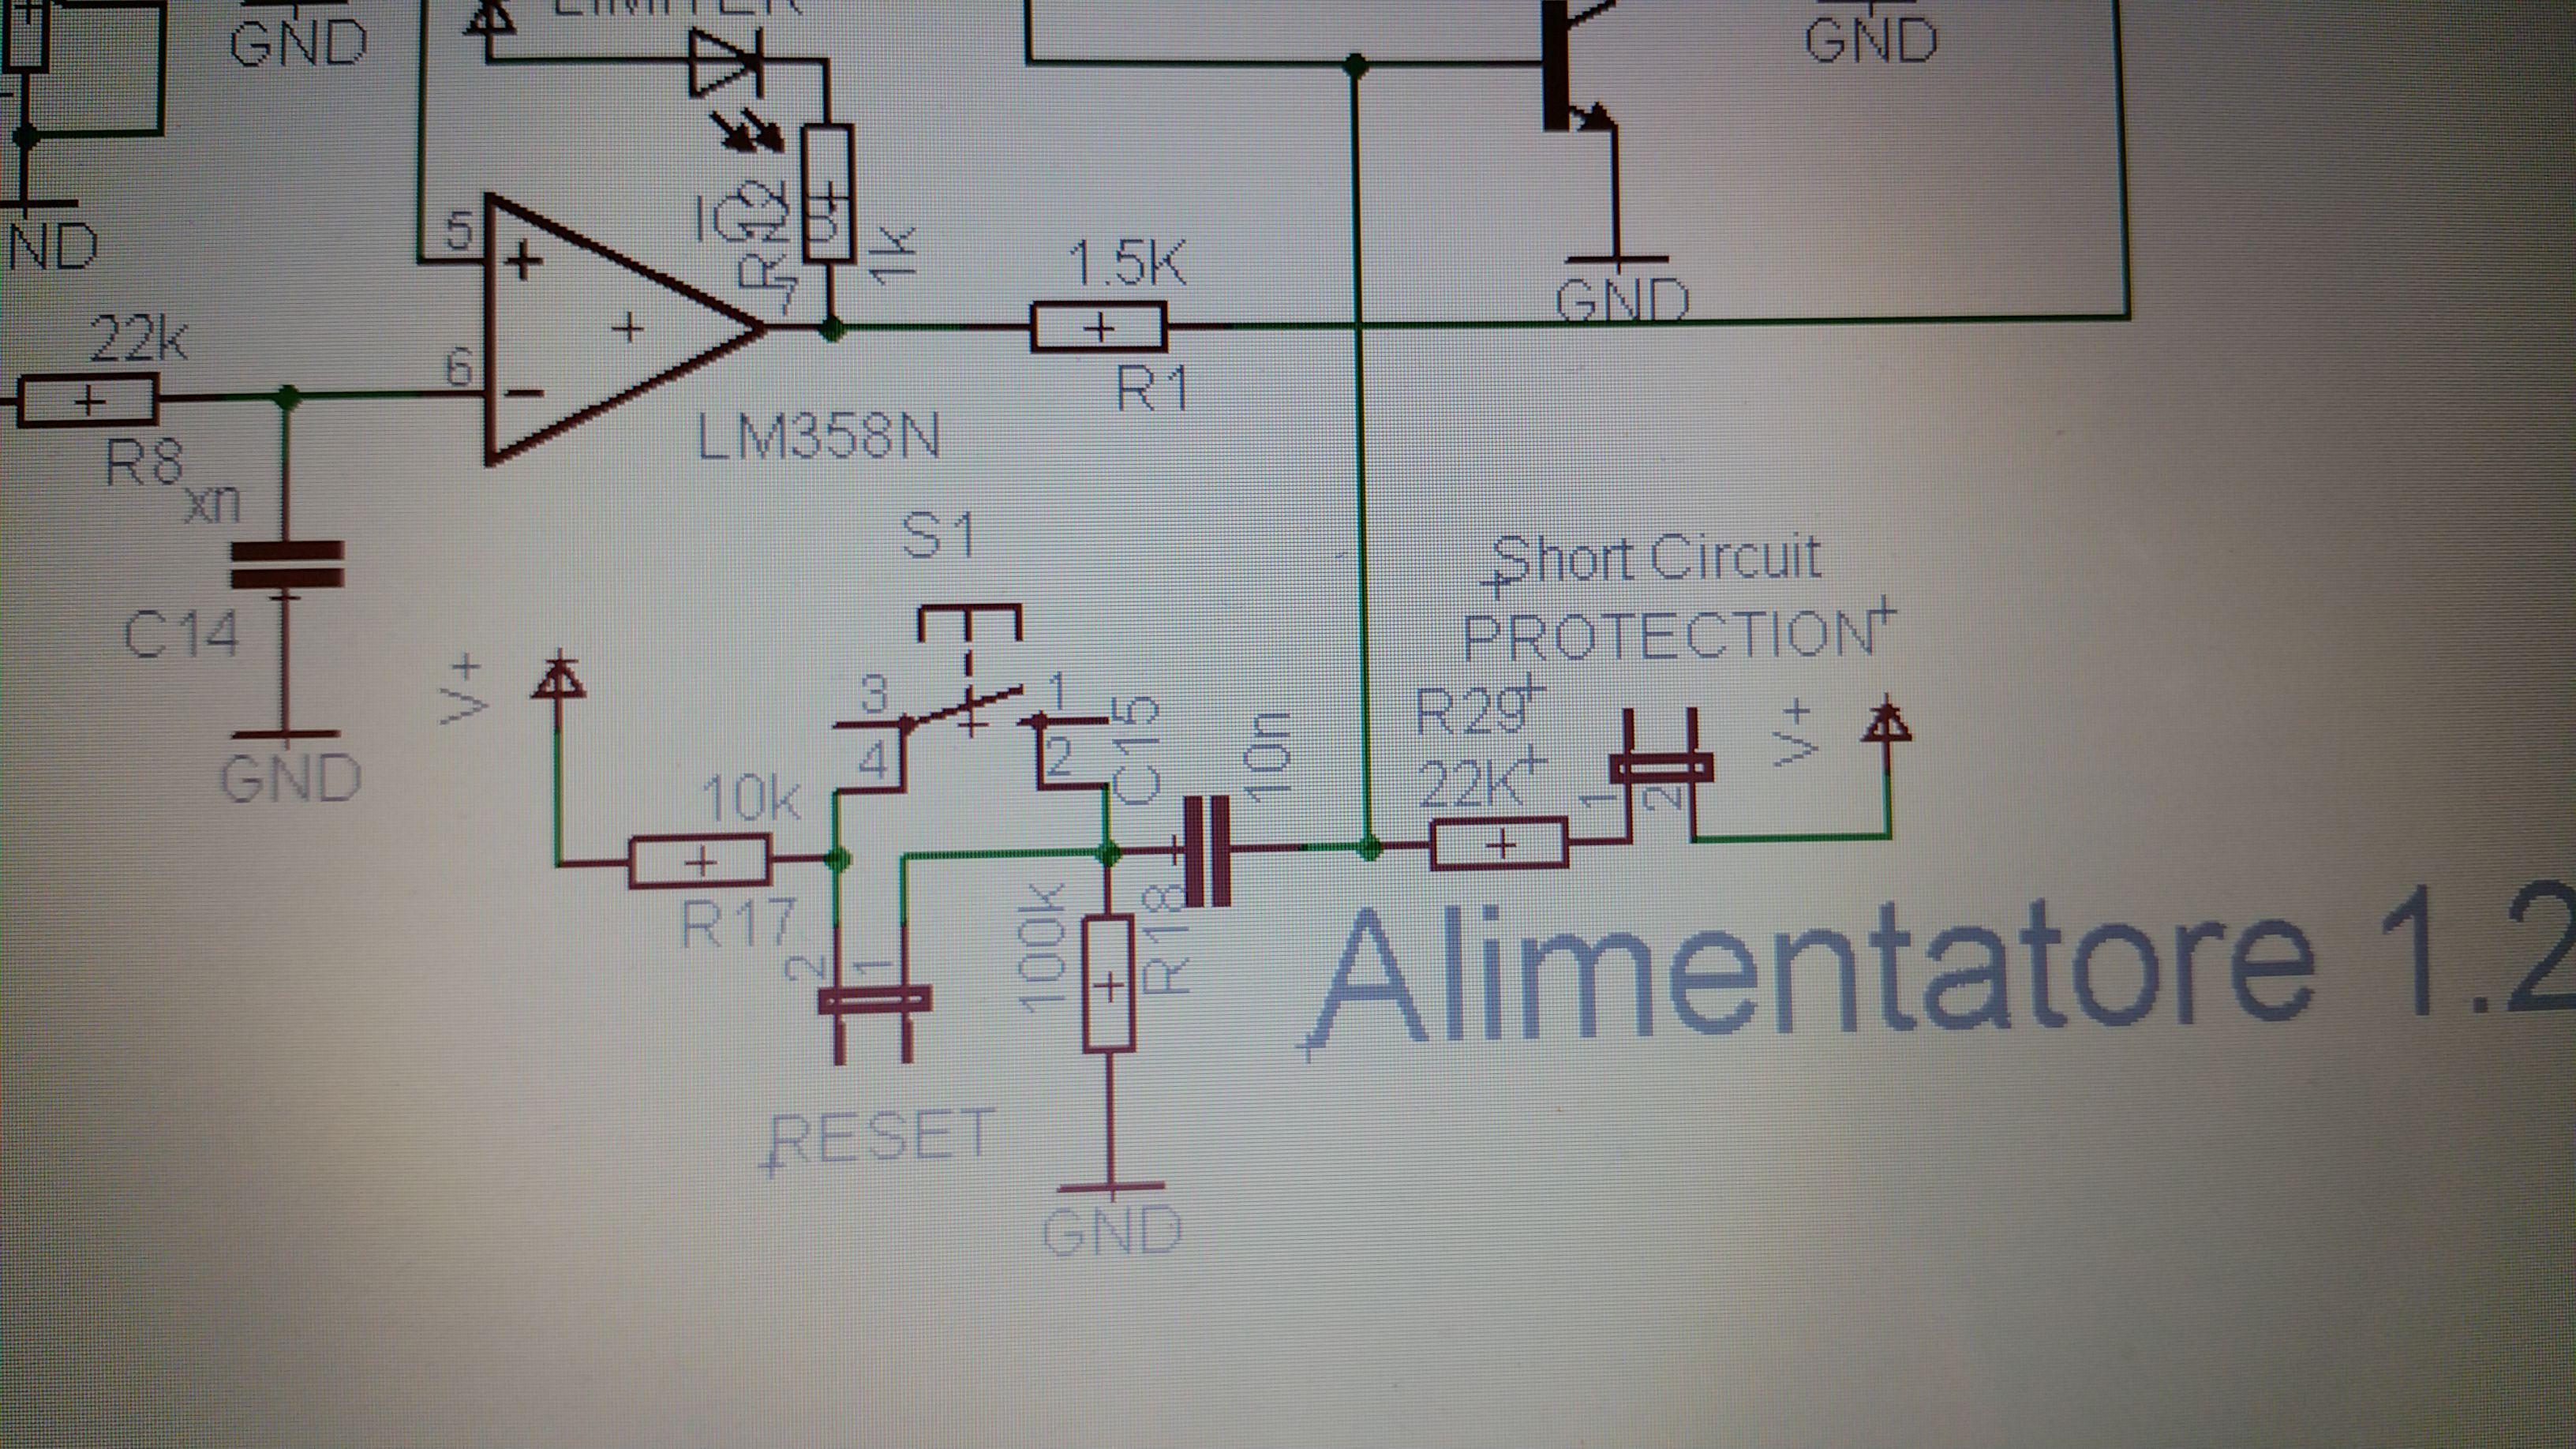 Schema Elettrico Alimentatore : Energia alternativa laboratory alimentatore switching v a